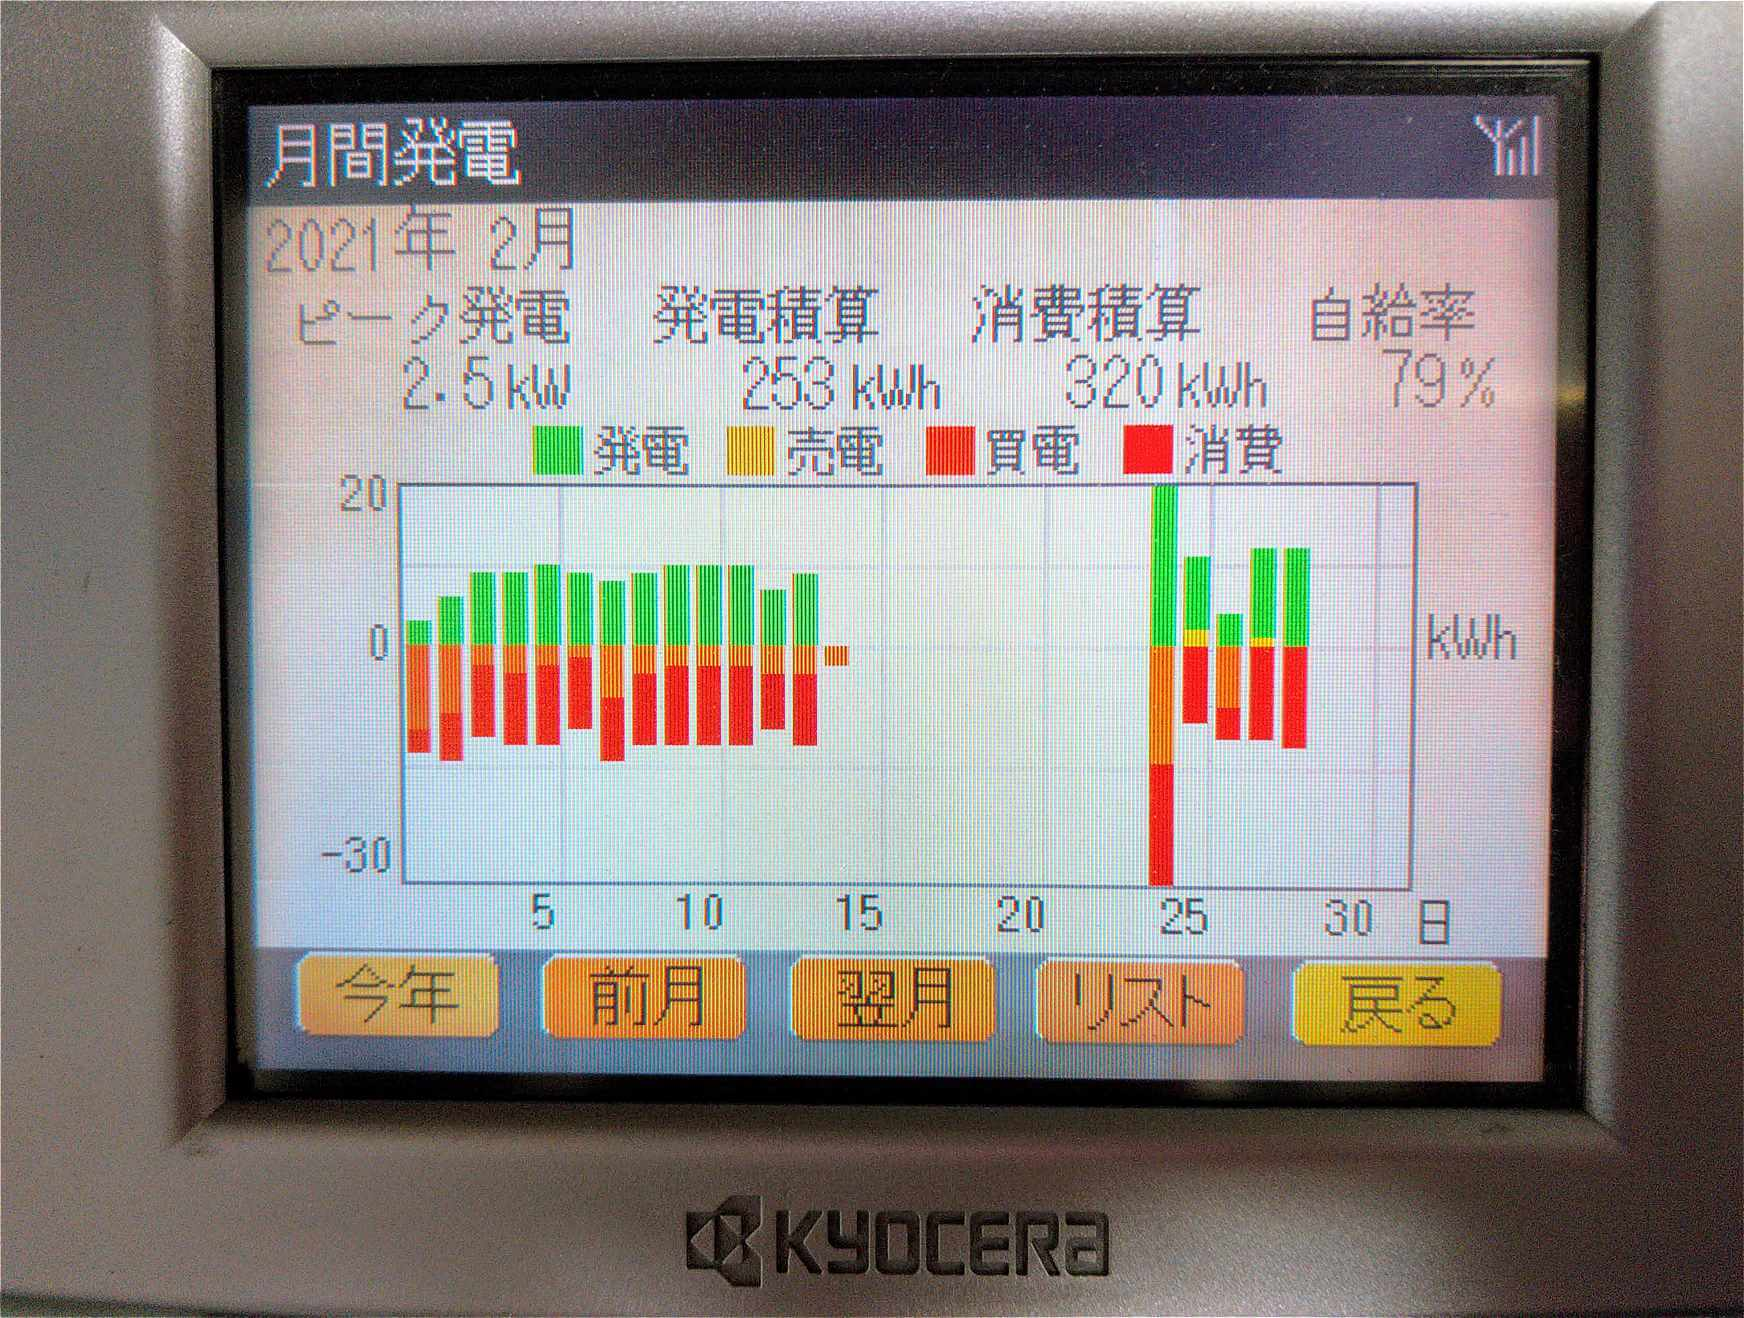 発電モニター復旧後の2月発電・消費実績